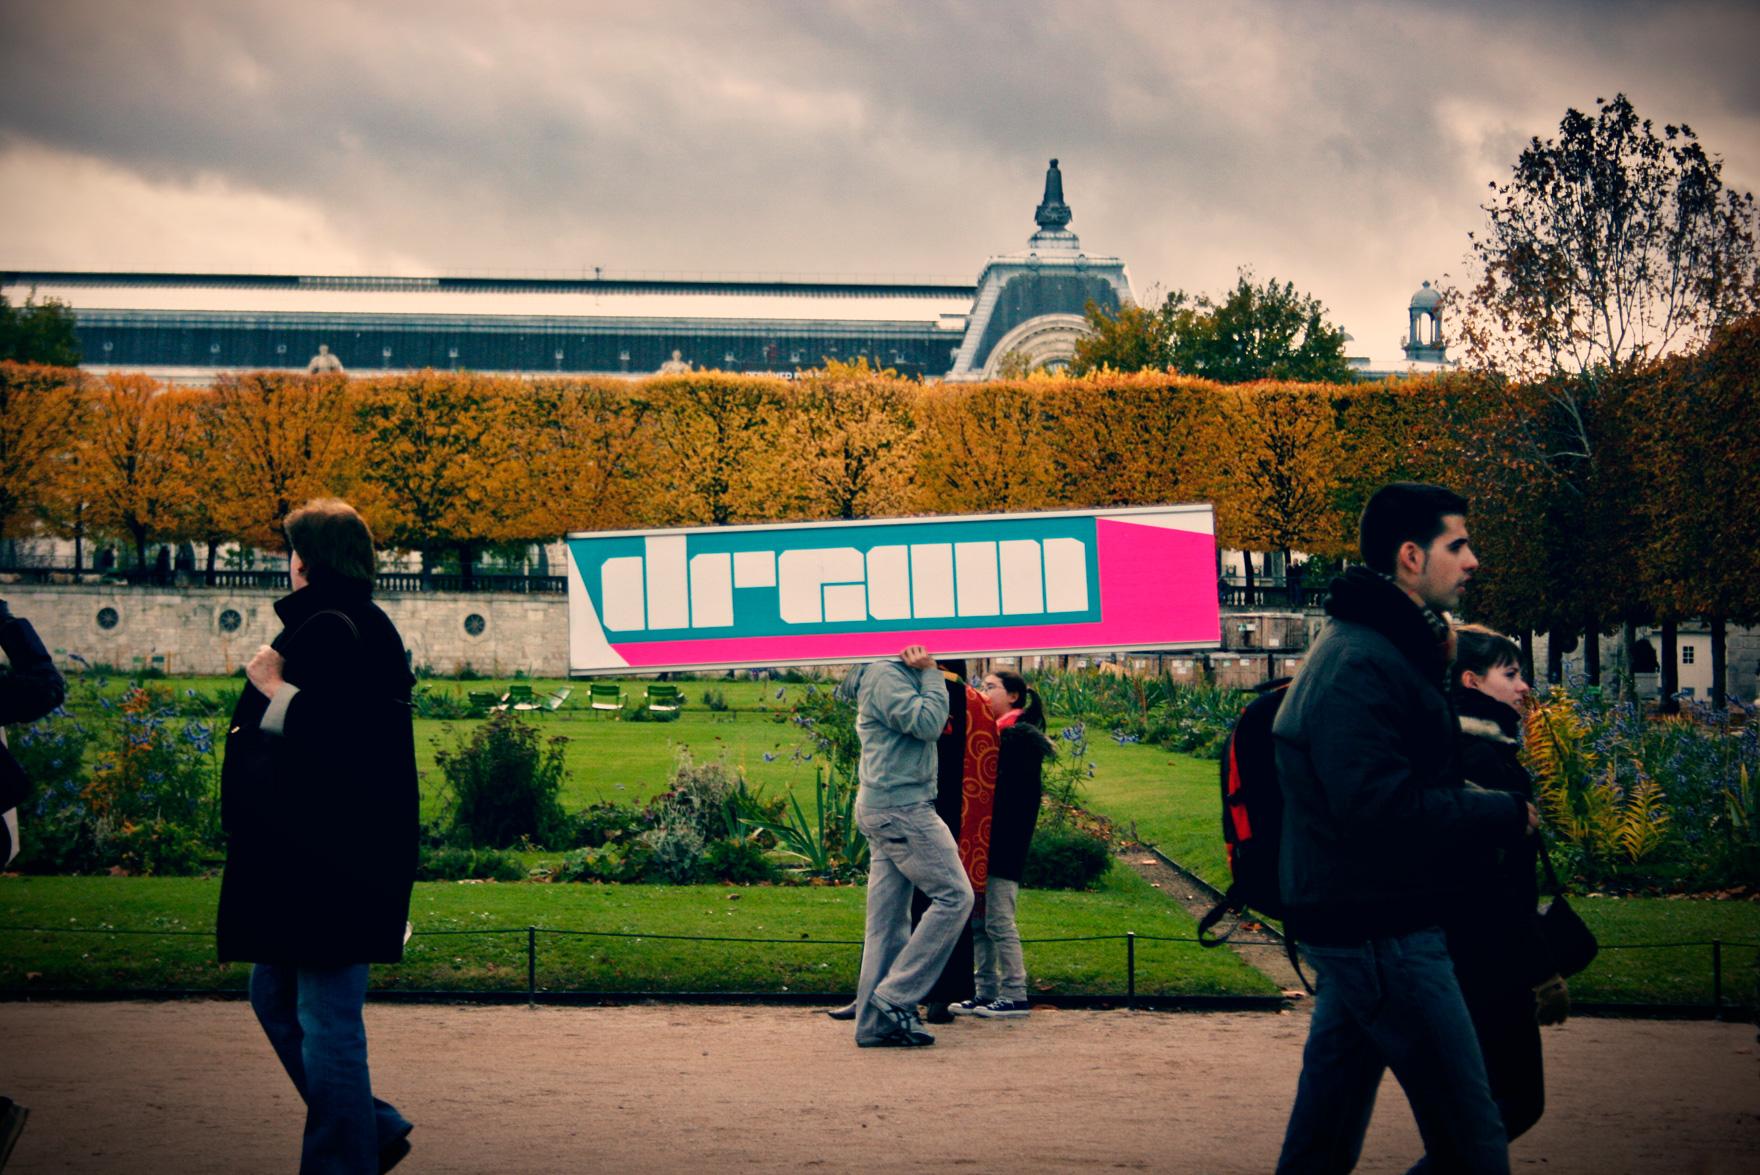 Tuileries_Garden_dream_Paris_by_camilo_rojas_paris (11)_o.jpg